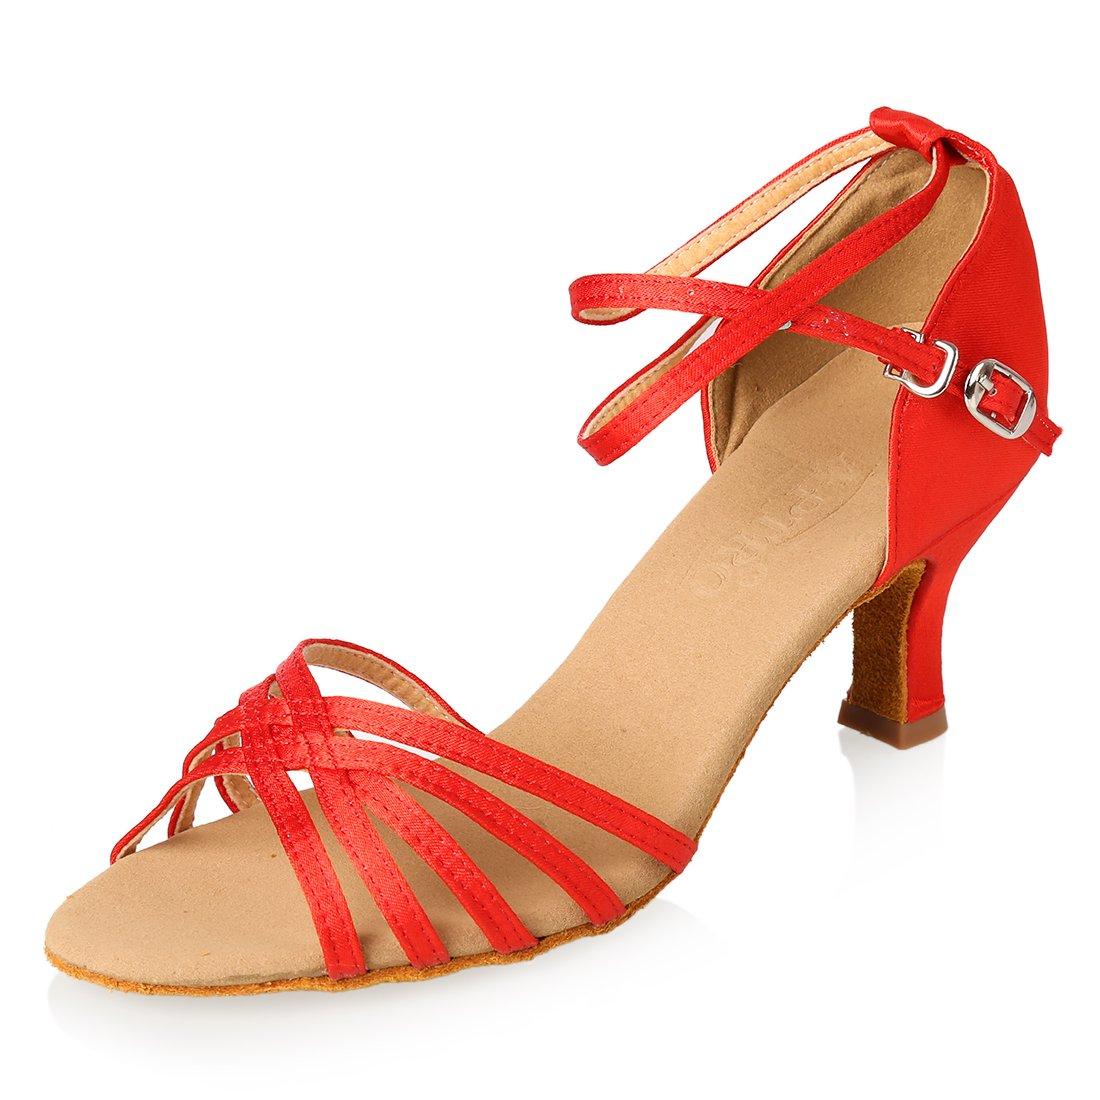 APTRO Damen Schuhe Tanzschuhe Ballsaal Latin Tanzen Silber Sandalen  36 EU|Rot